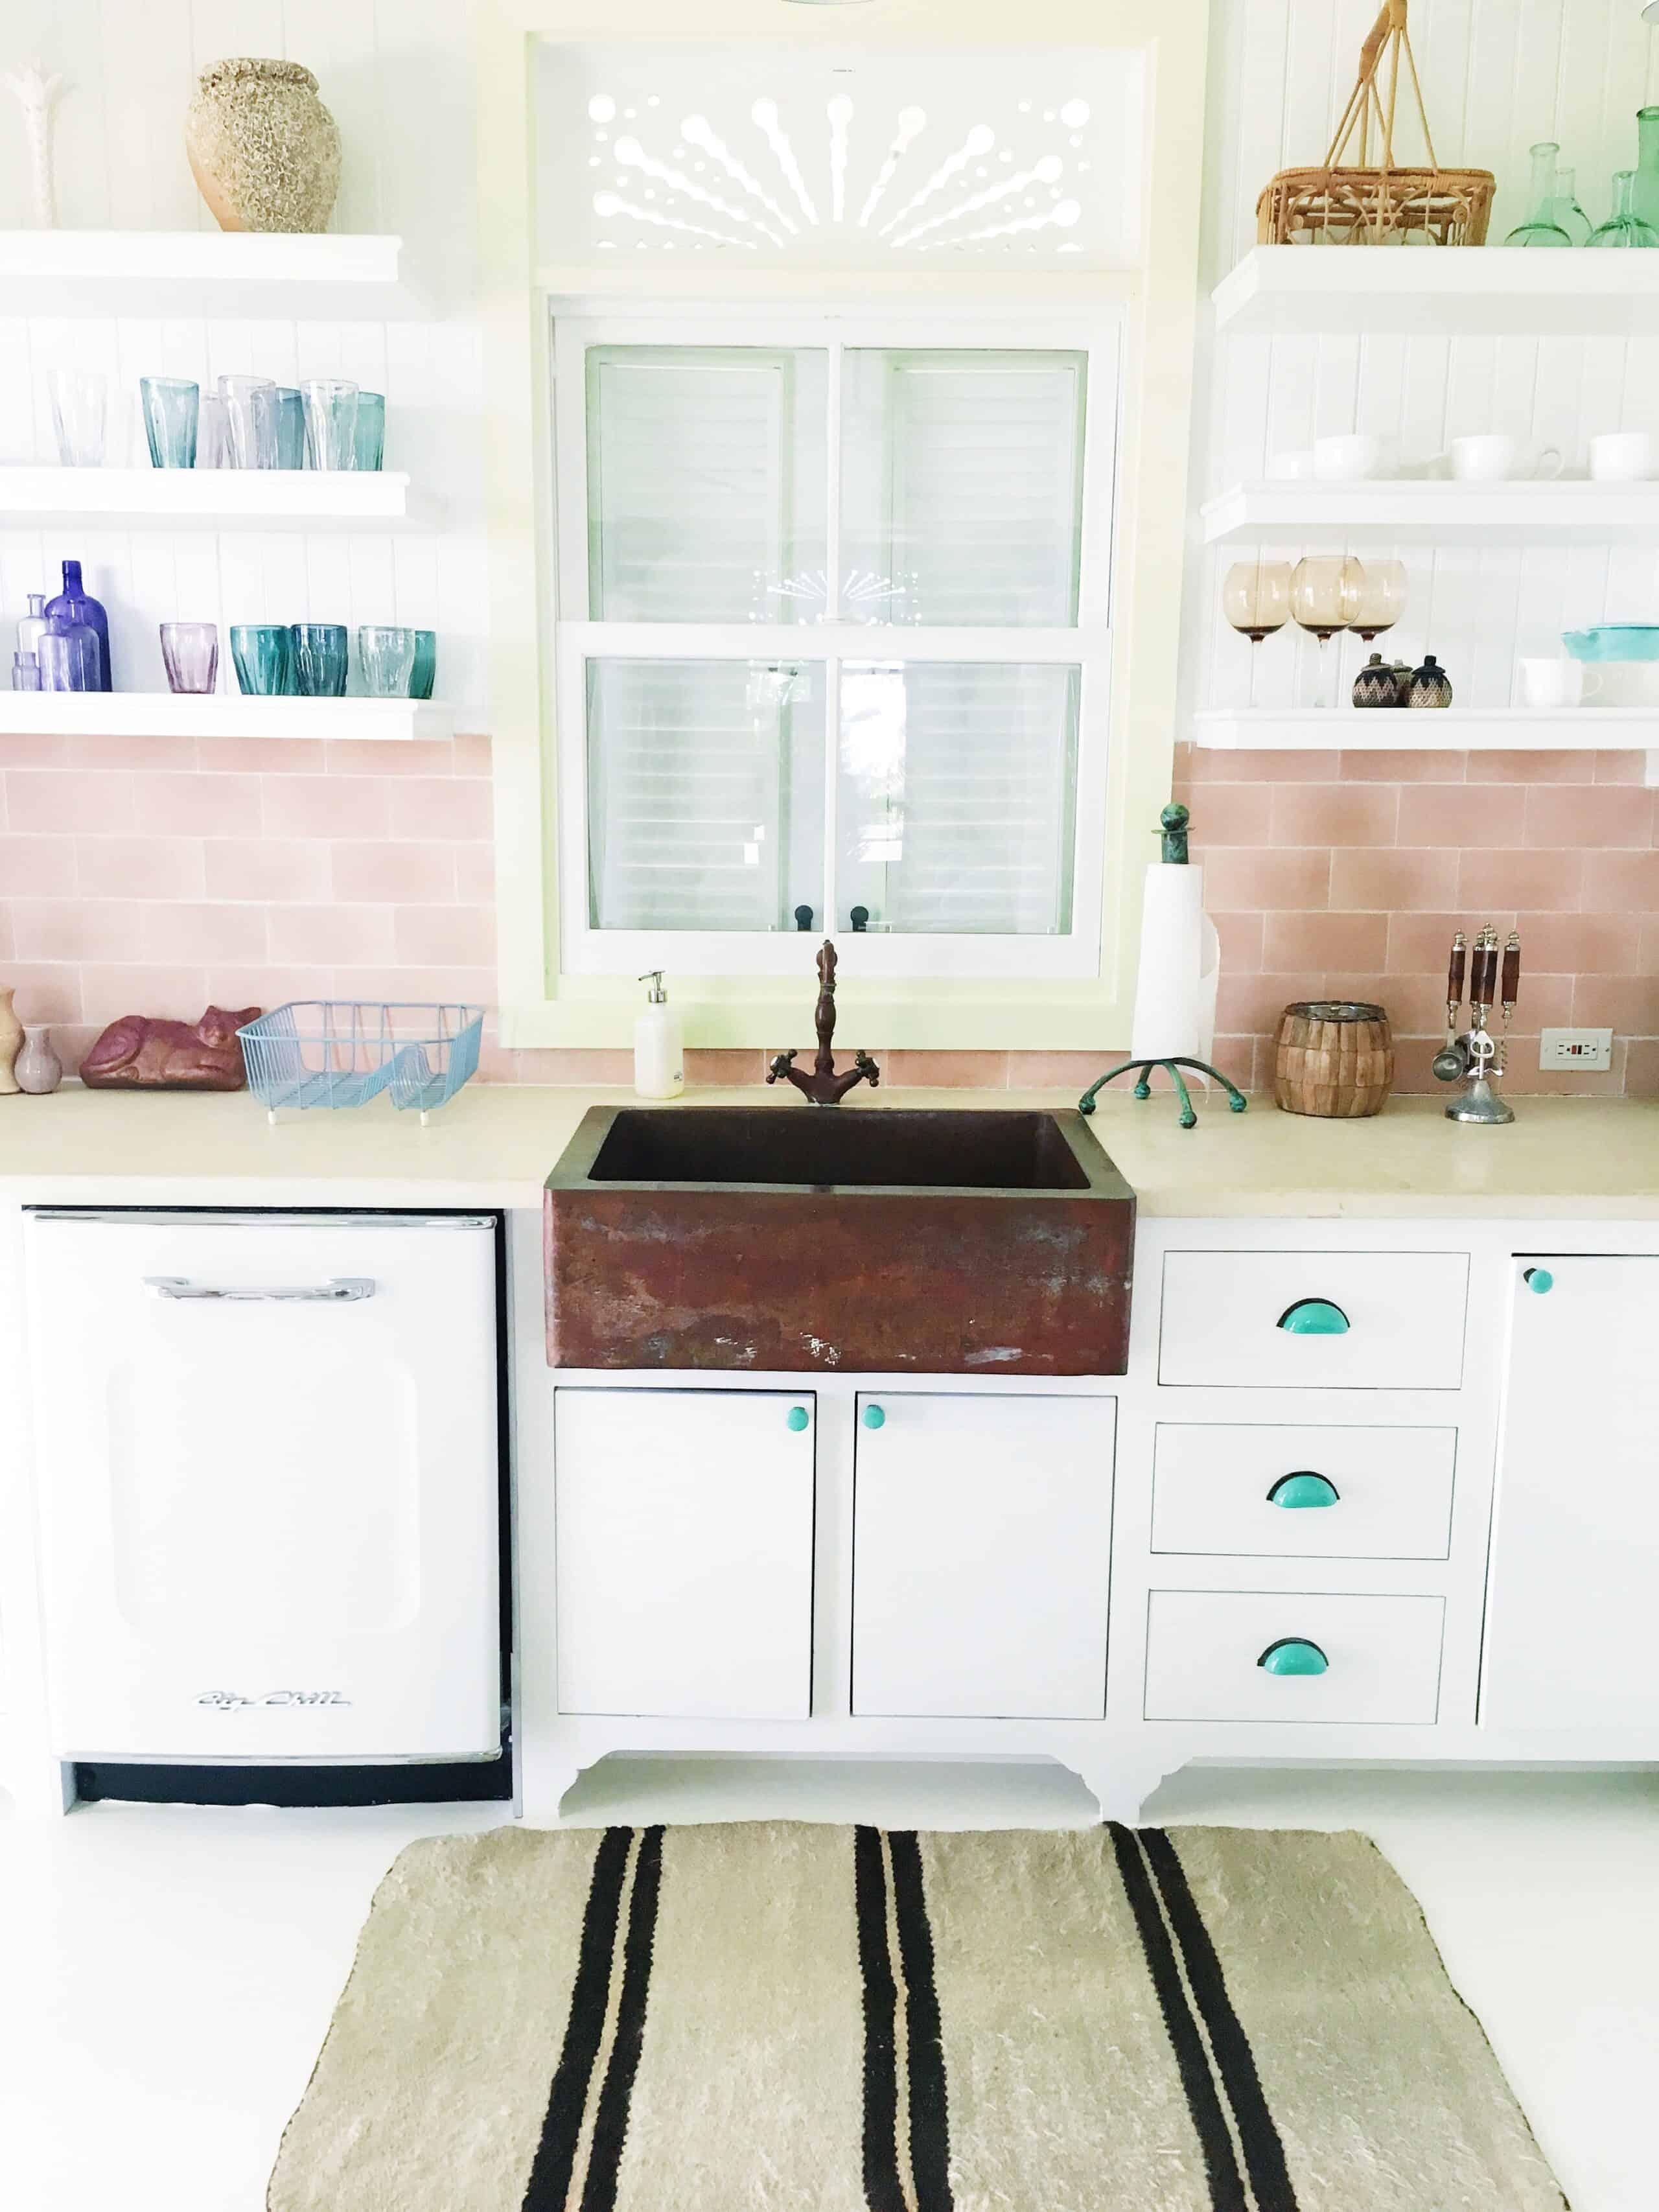 retro kitchen pink tile backsplash copper farmhouse farm sink